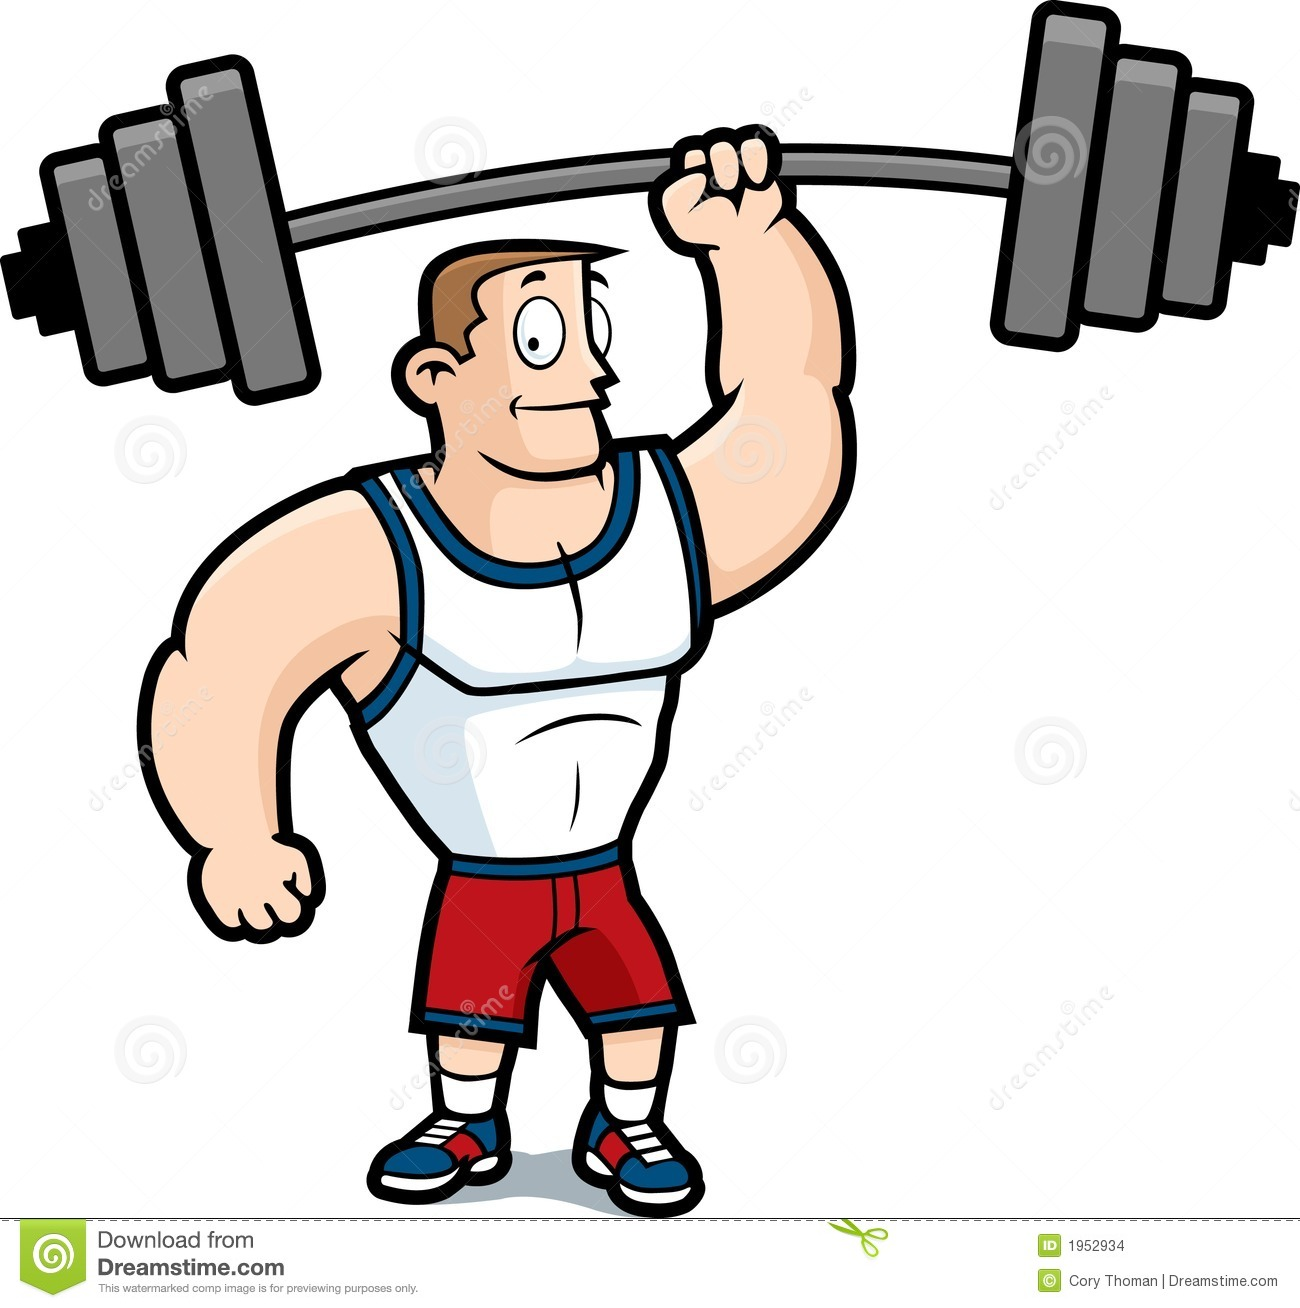 Gym clipart. Man